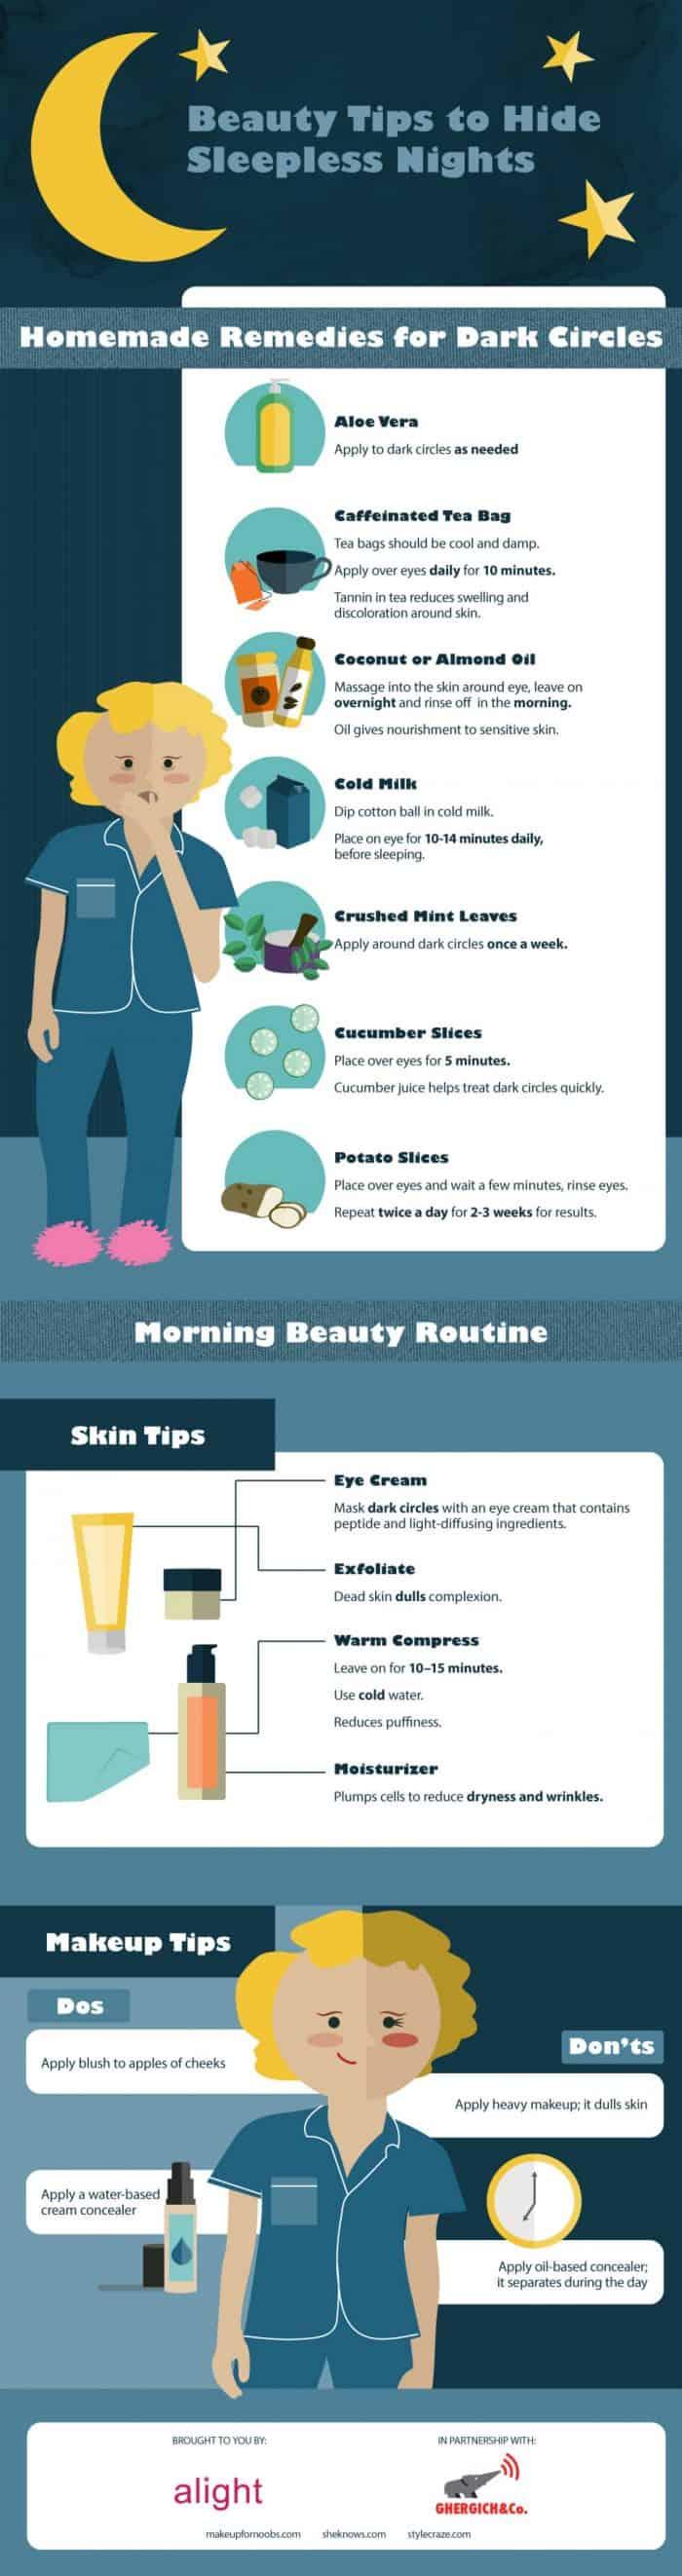 Beauty Tips To Help Hide Sleepless Nights